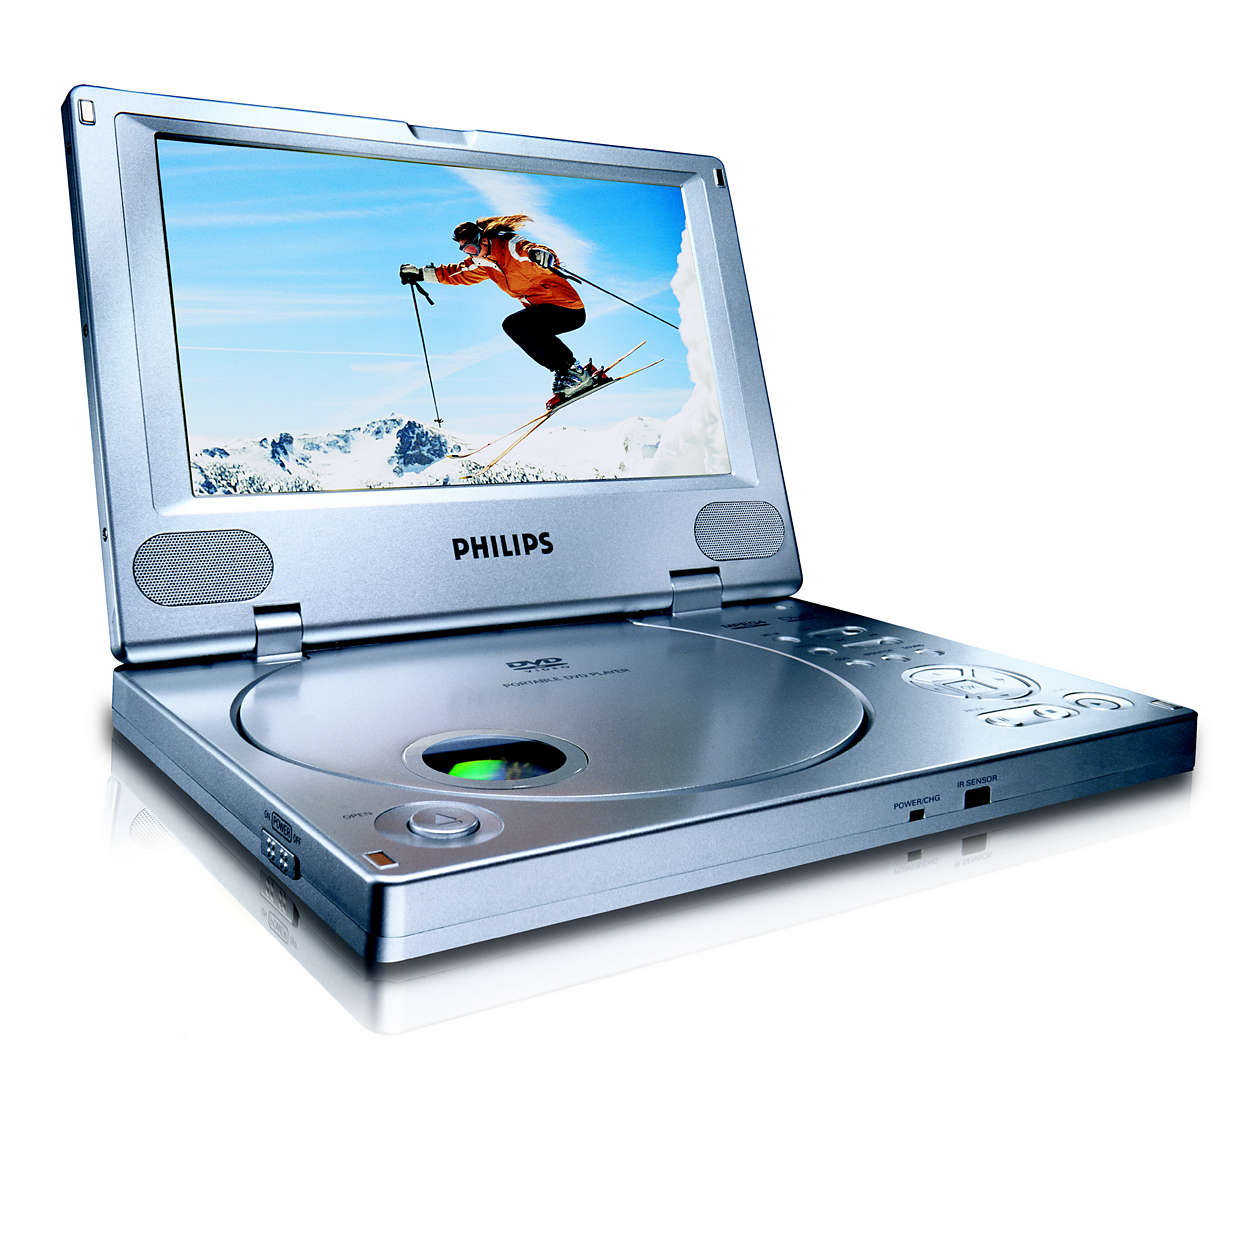 Assapora DVD e video digitali ovunque